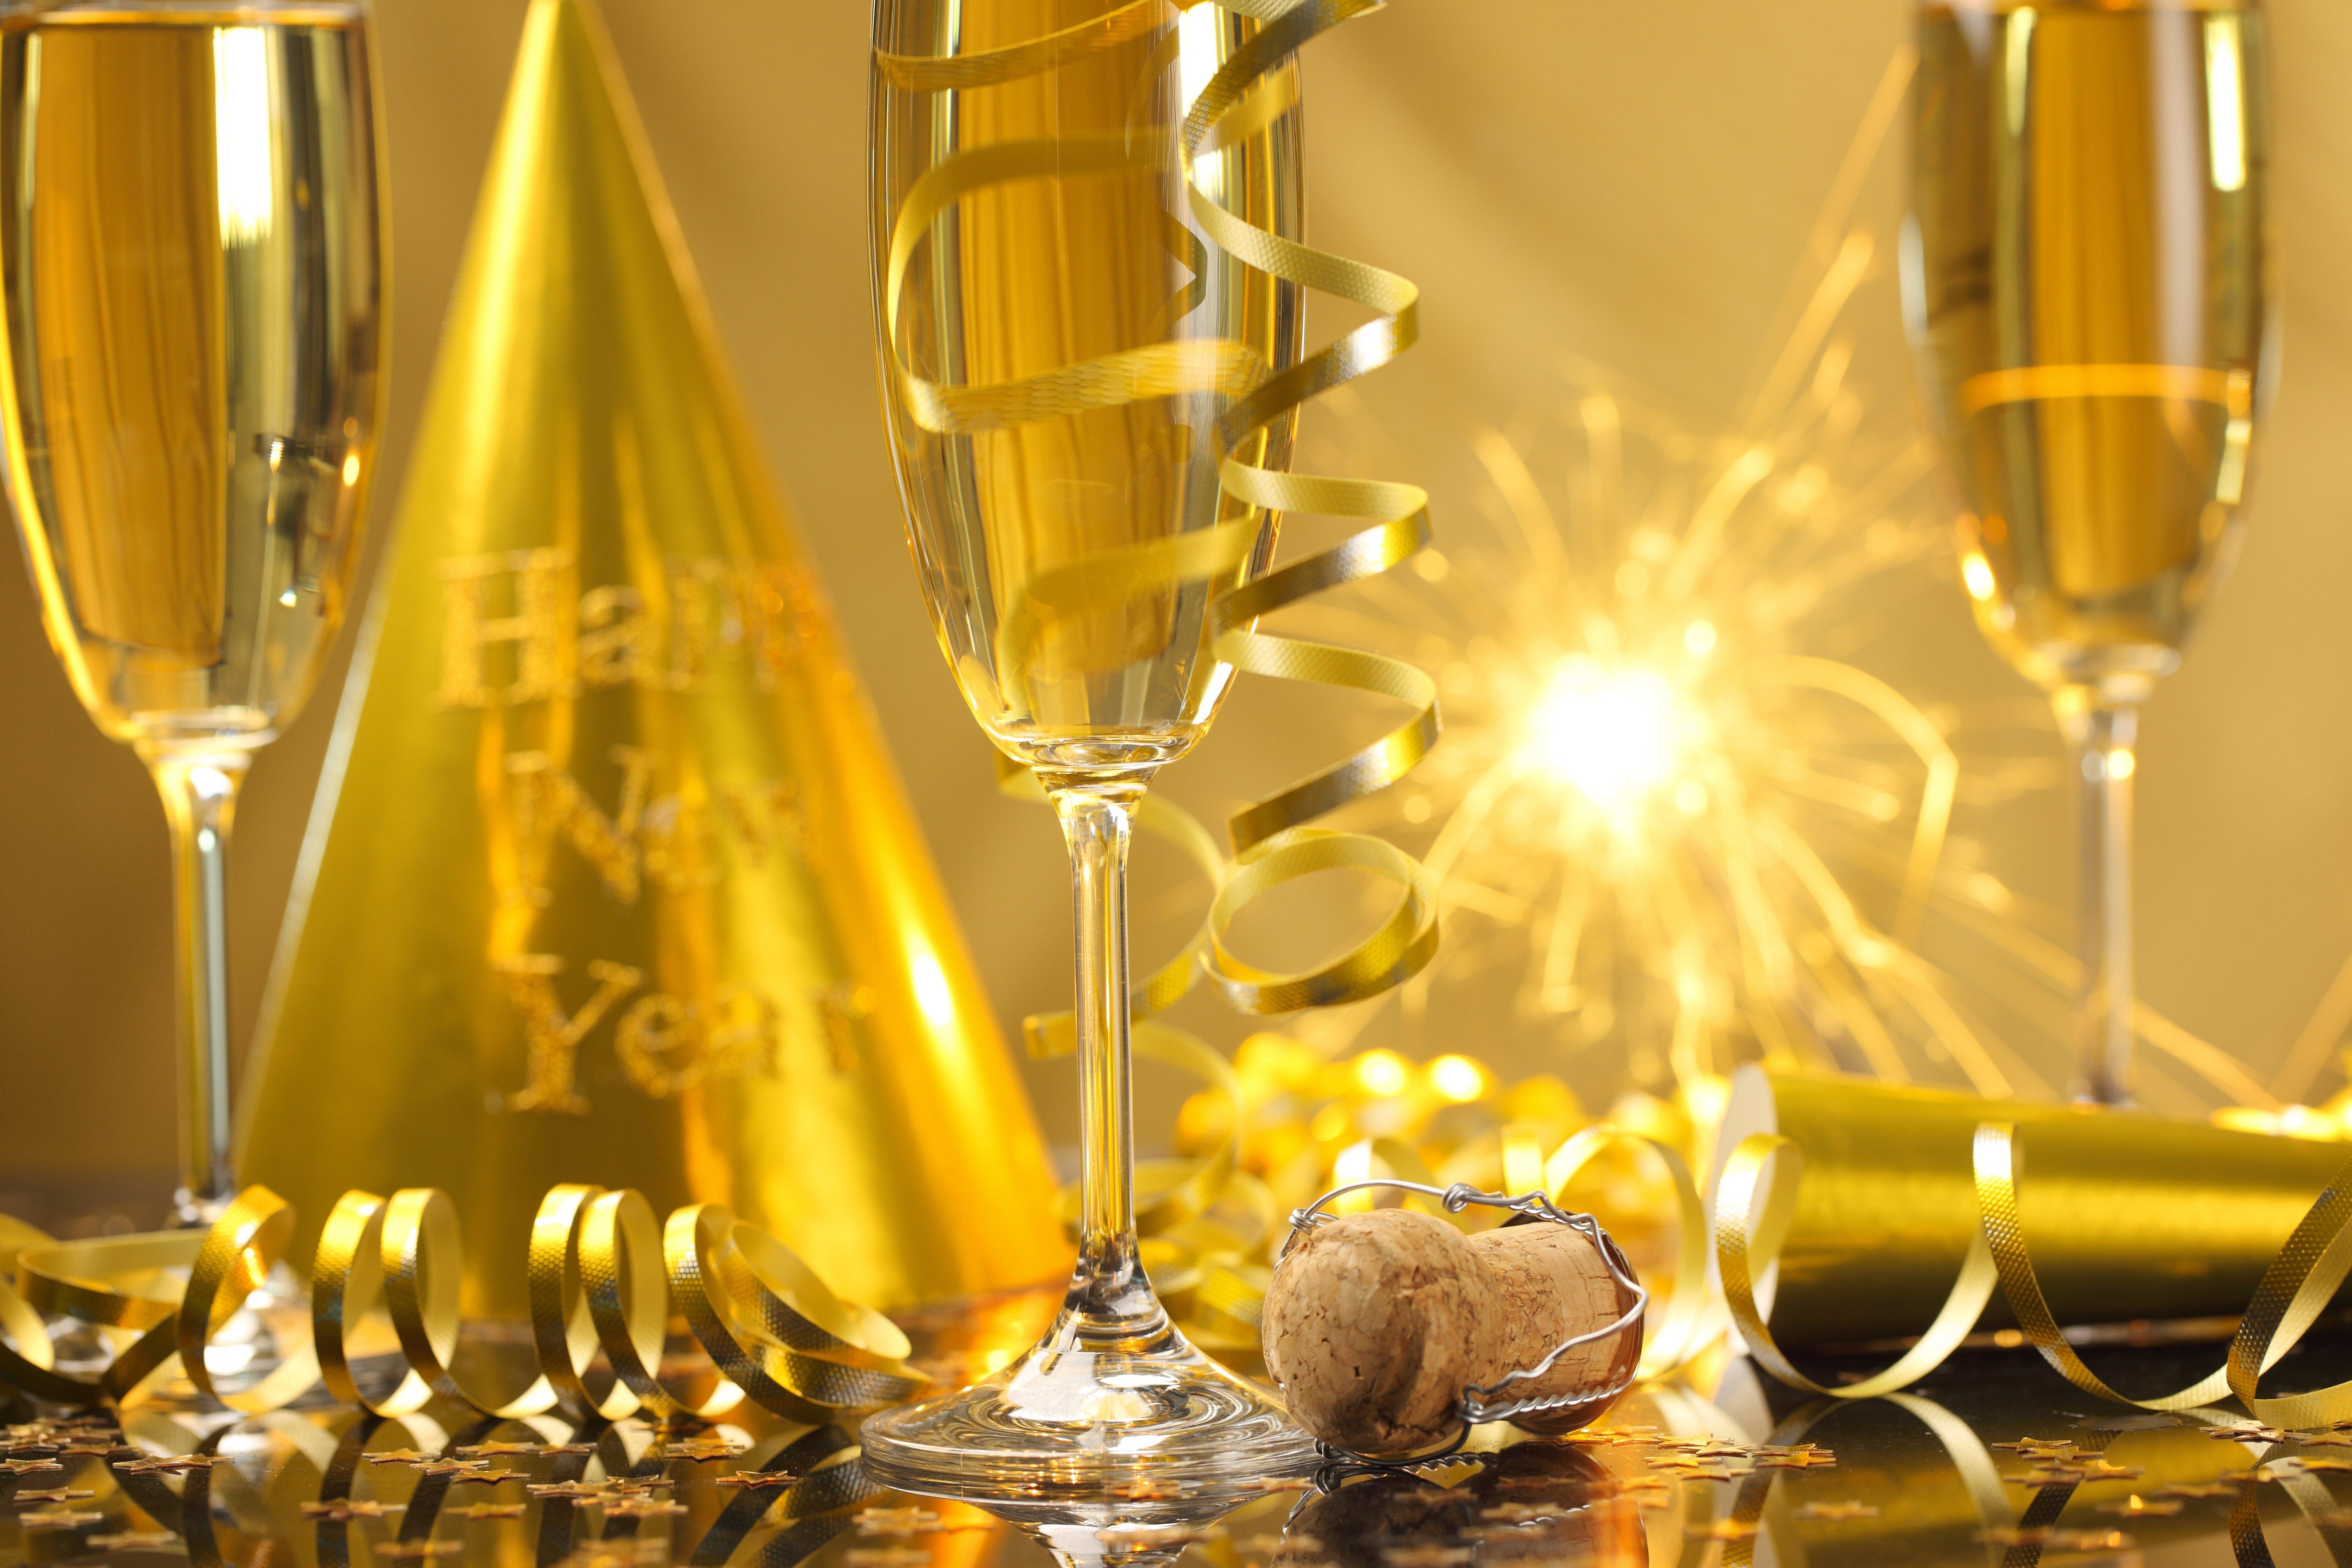 New Year champagne Happy New Year streamers celebration 5616x3744